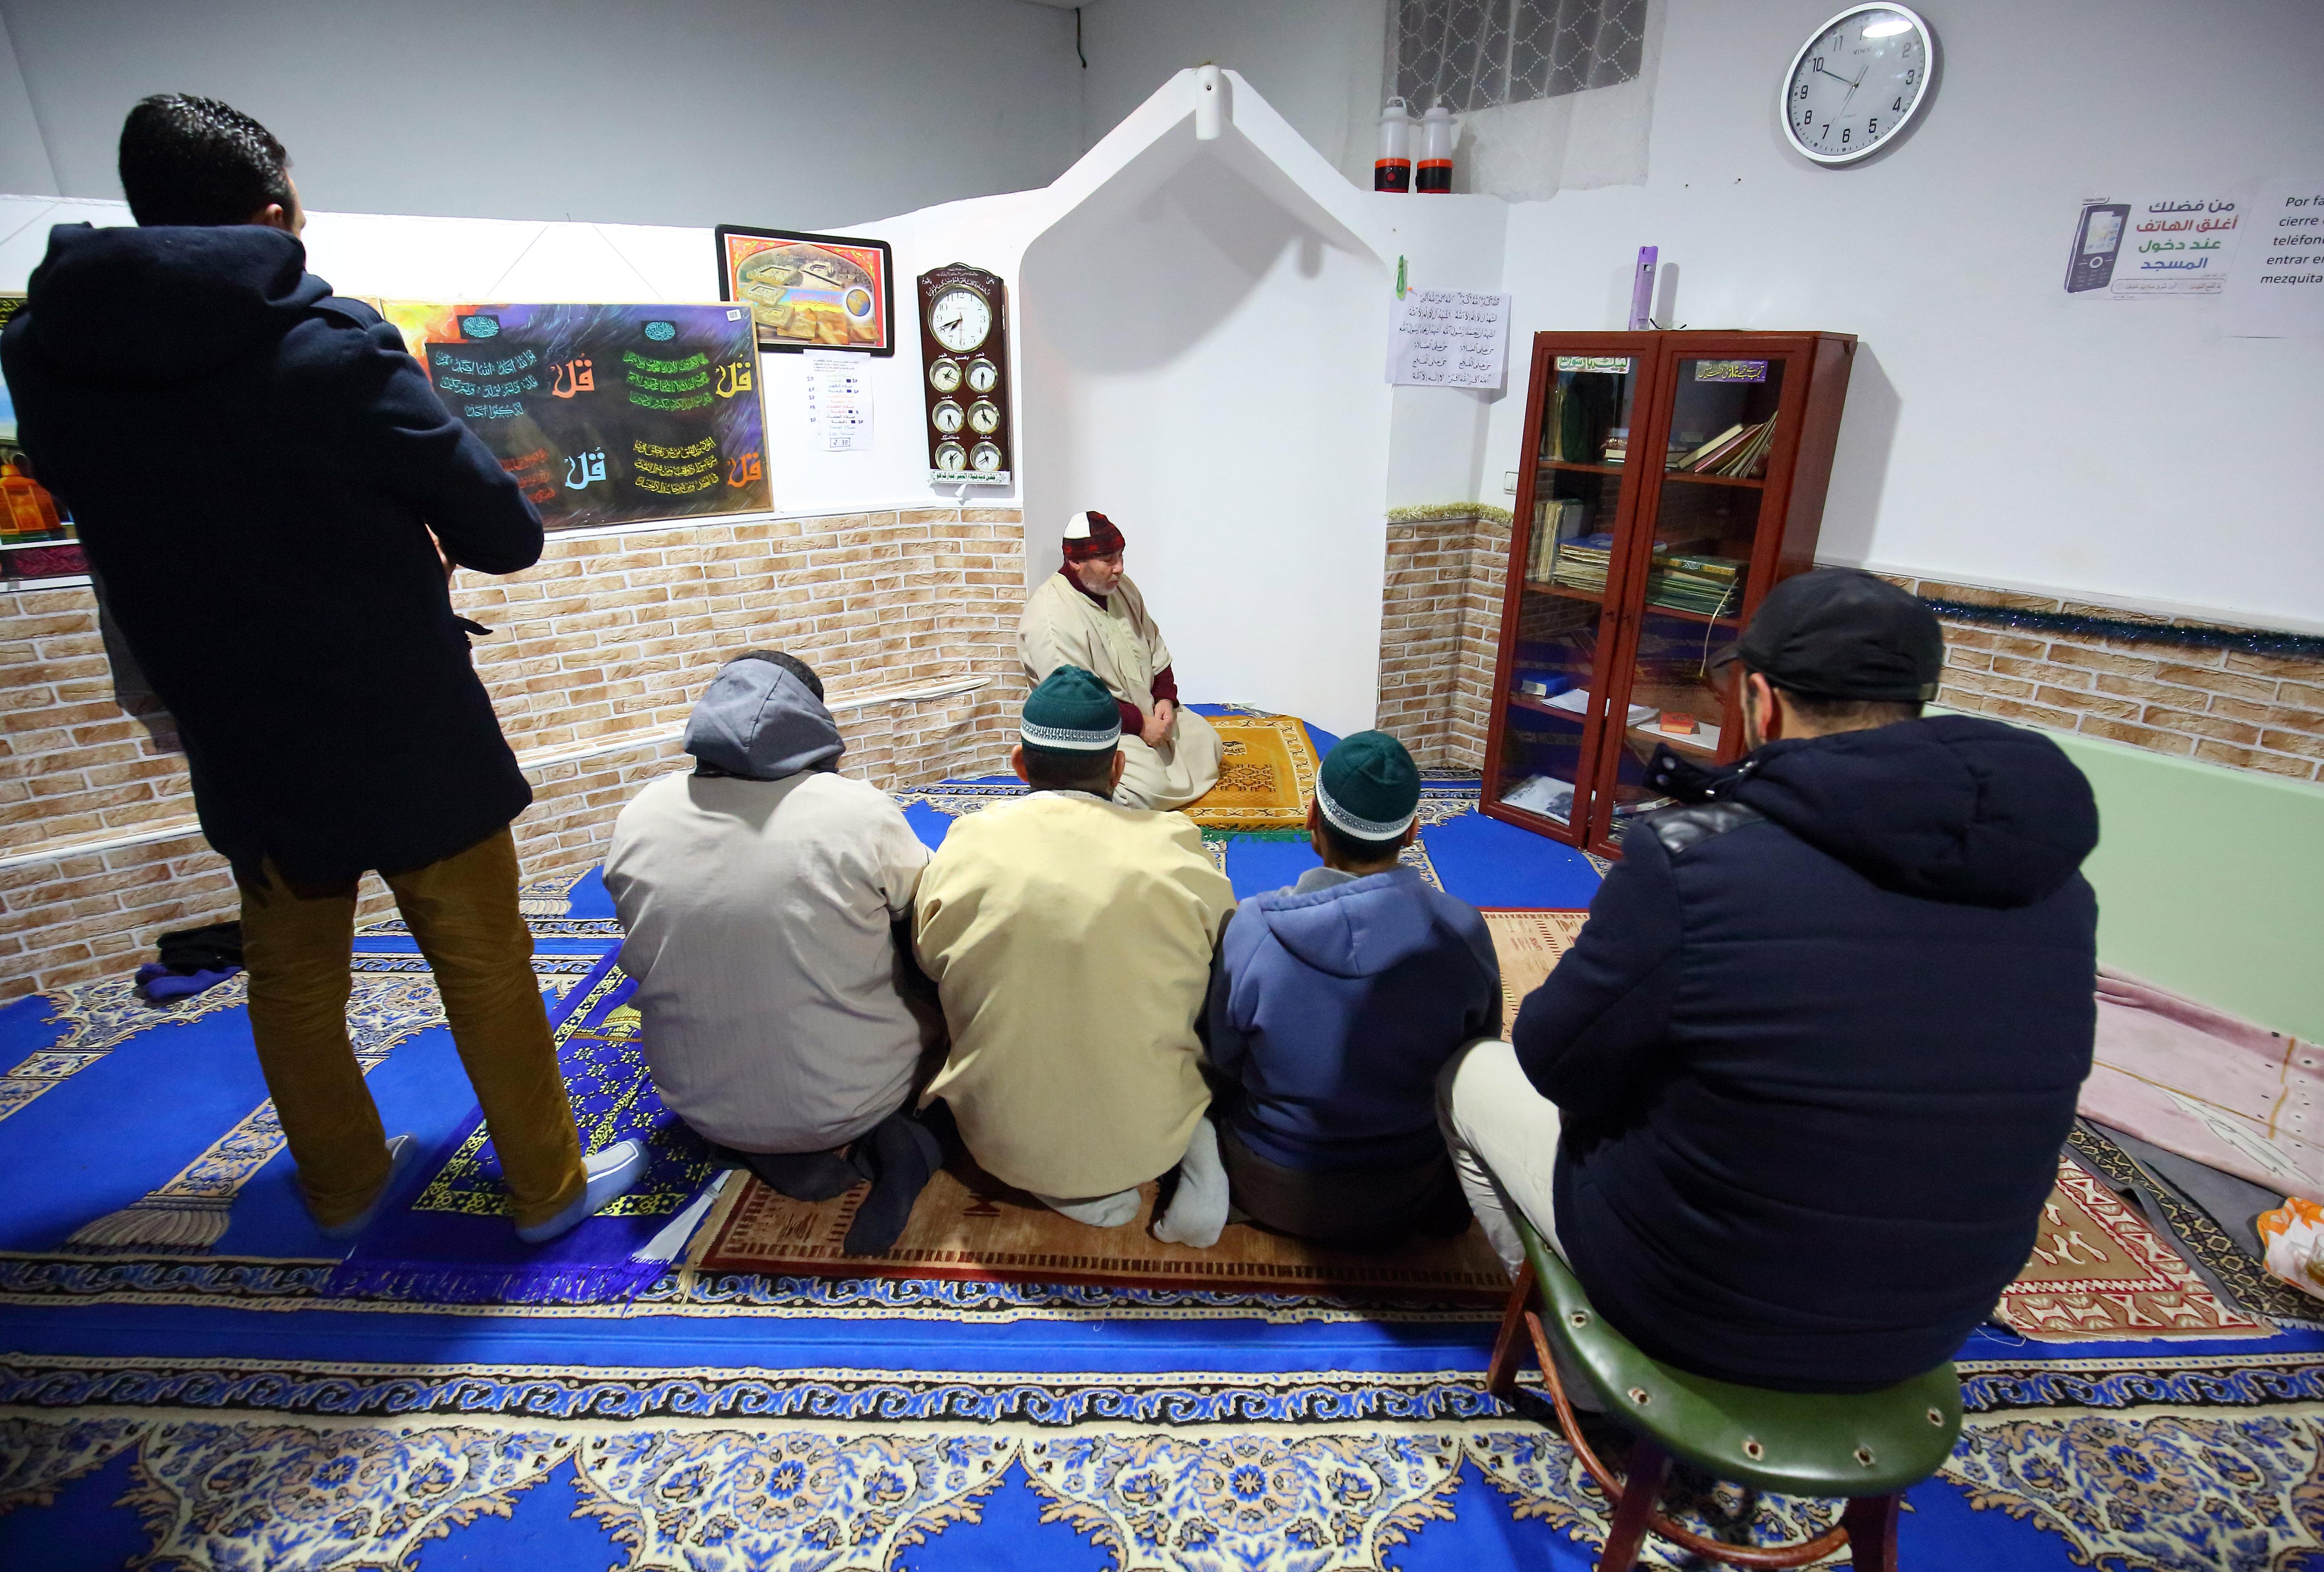 mezquita bembibre